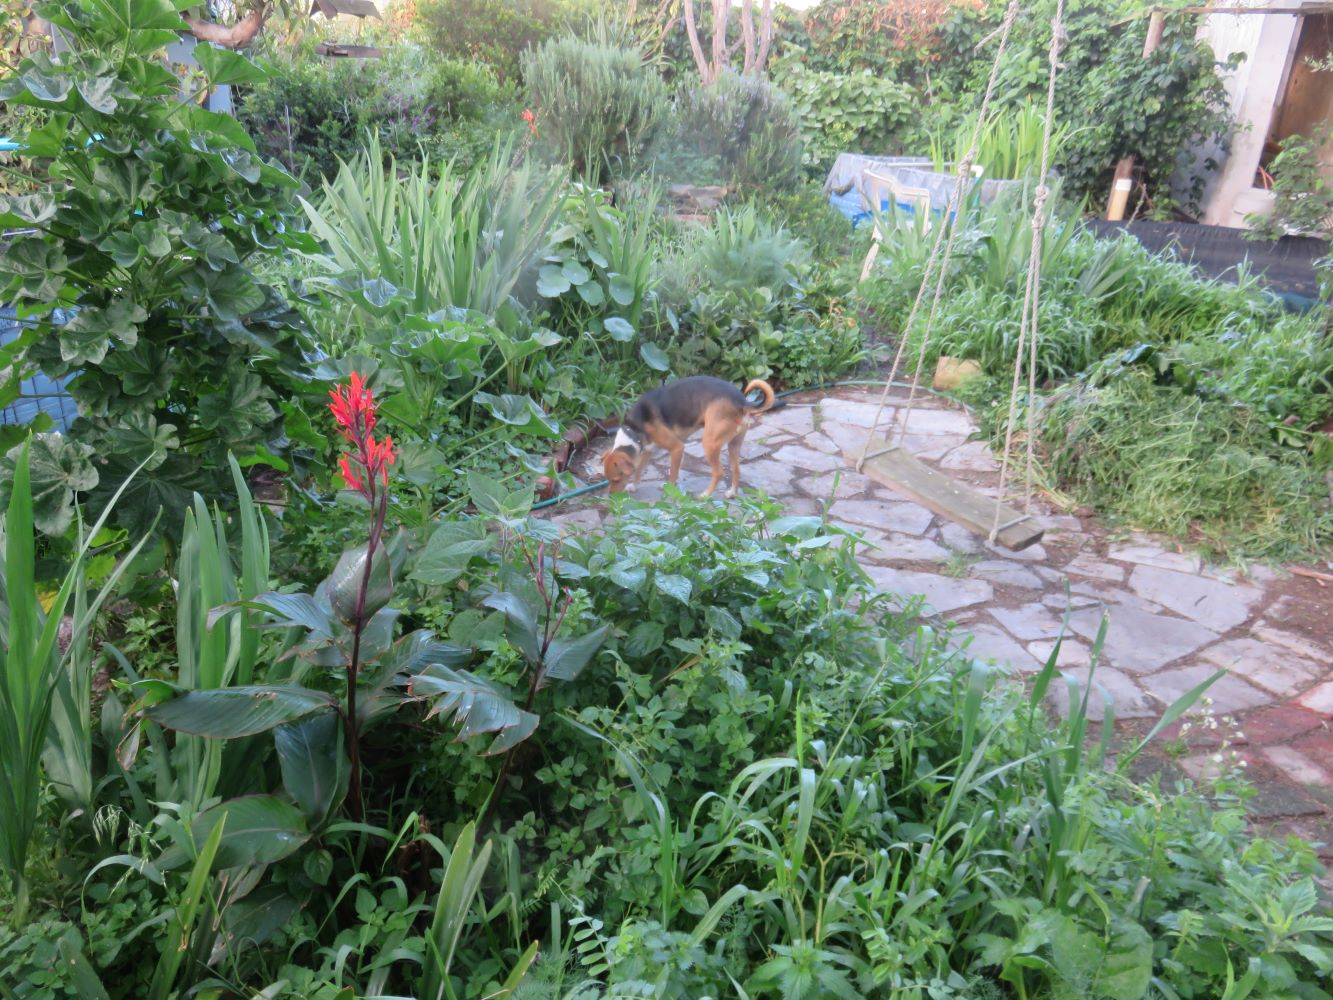 garden 8 months into soil regeneration